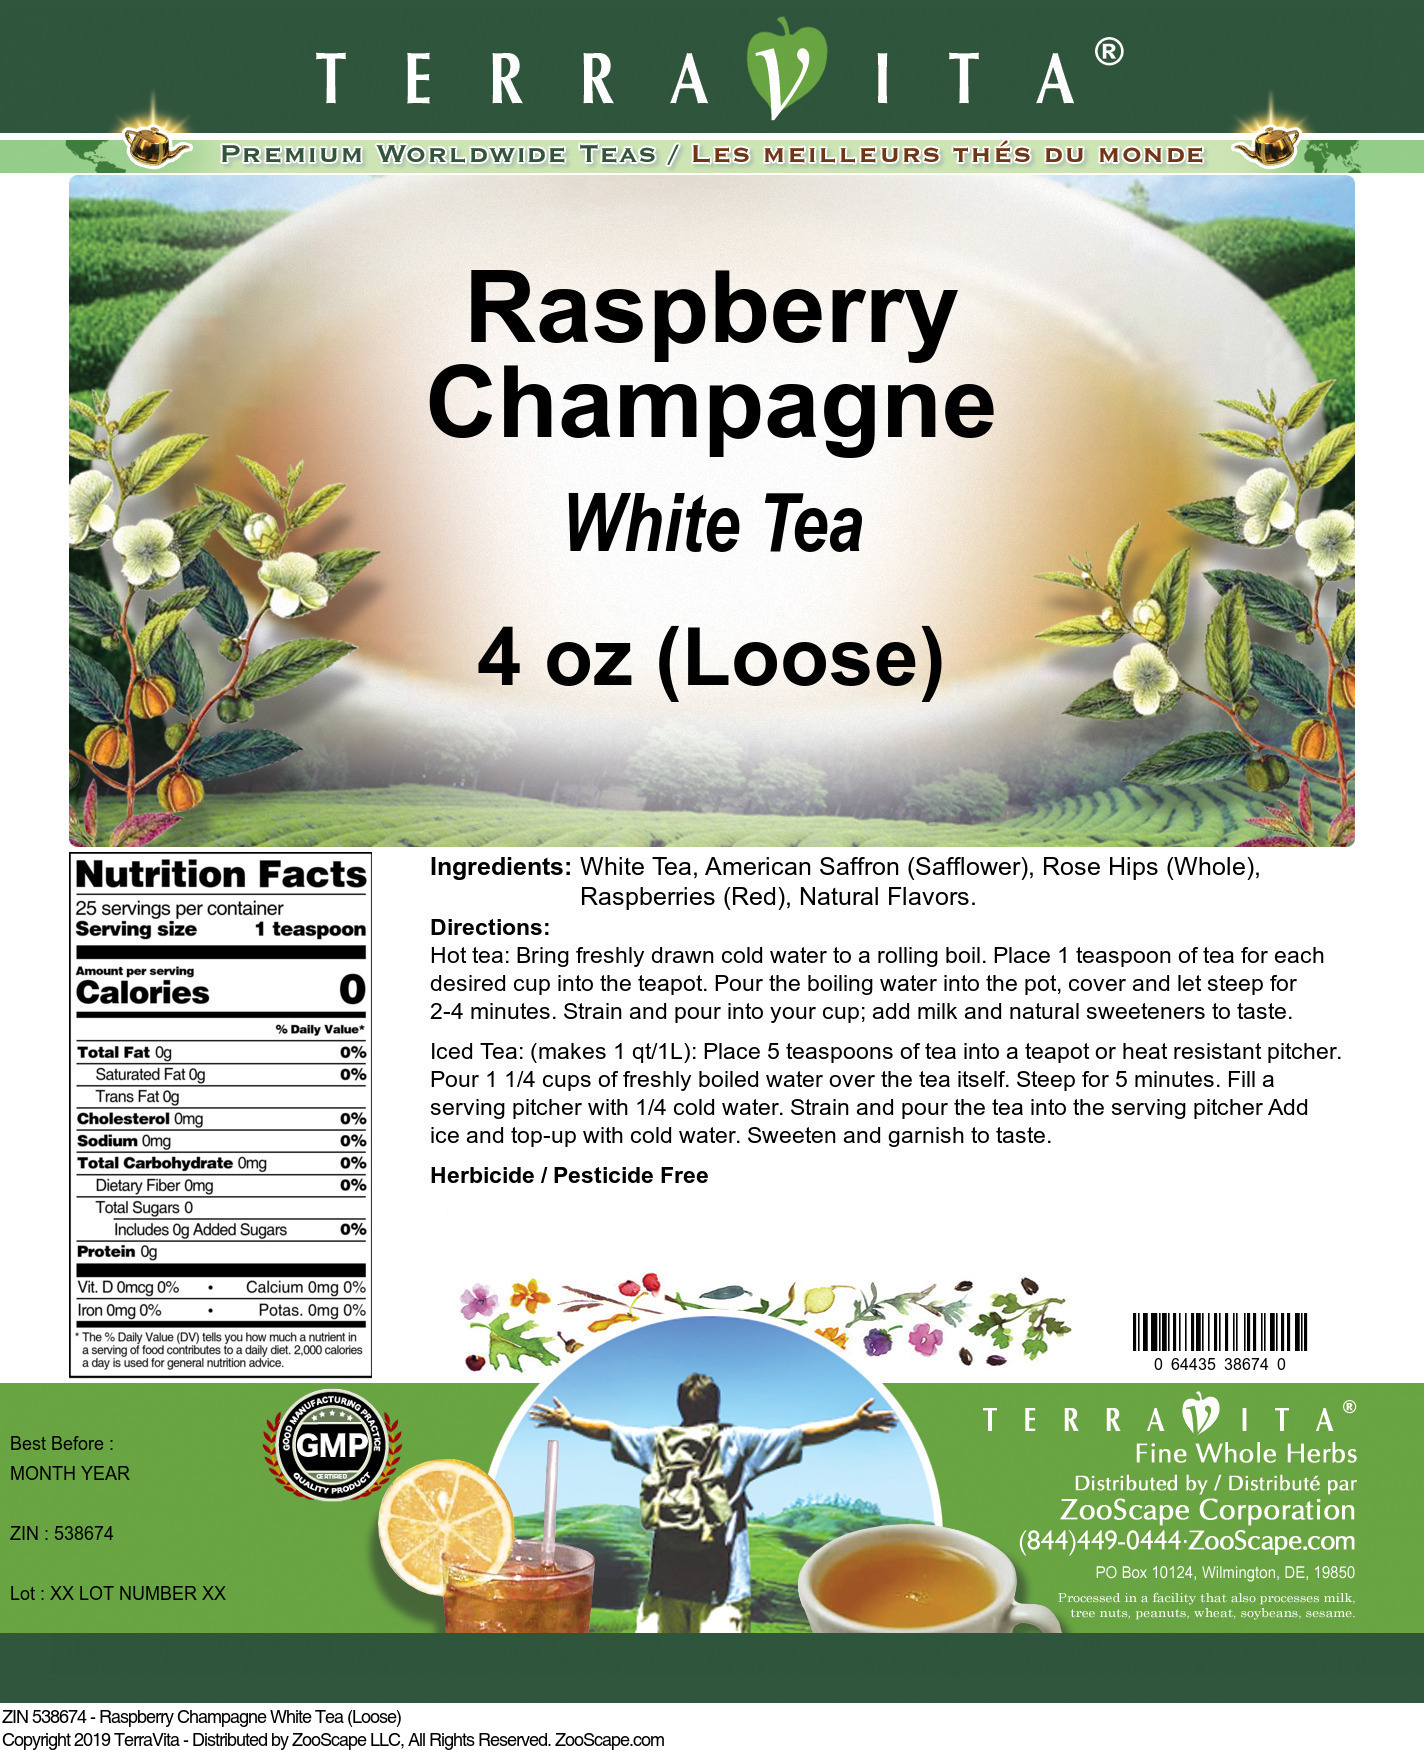 Raspberry Champagne White Tea (Loose)